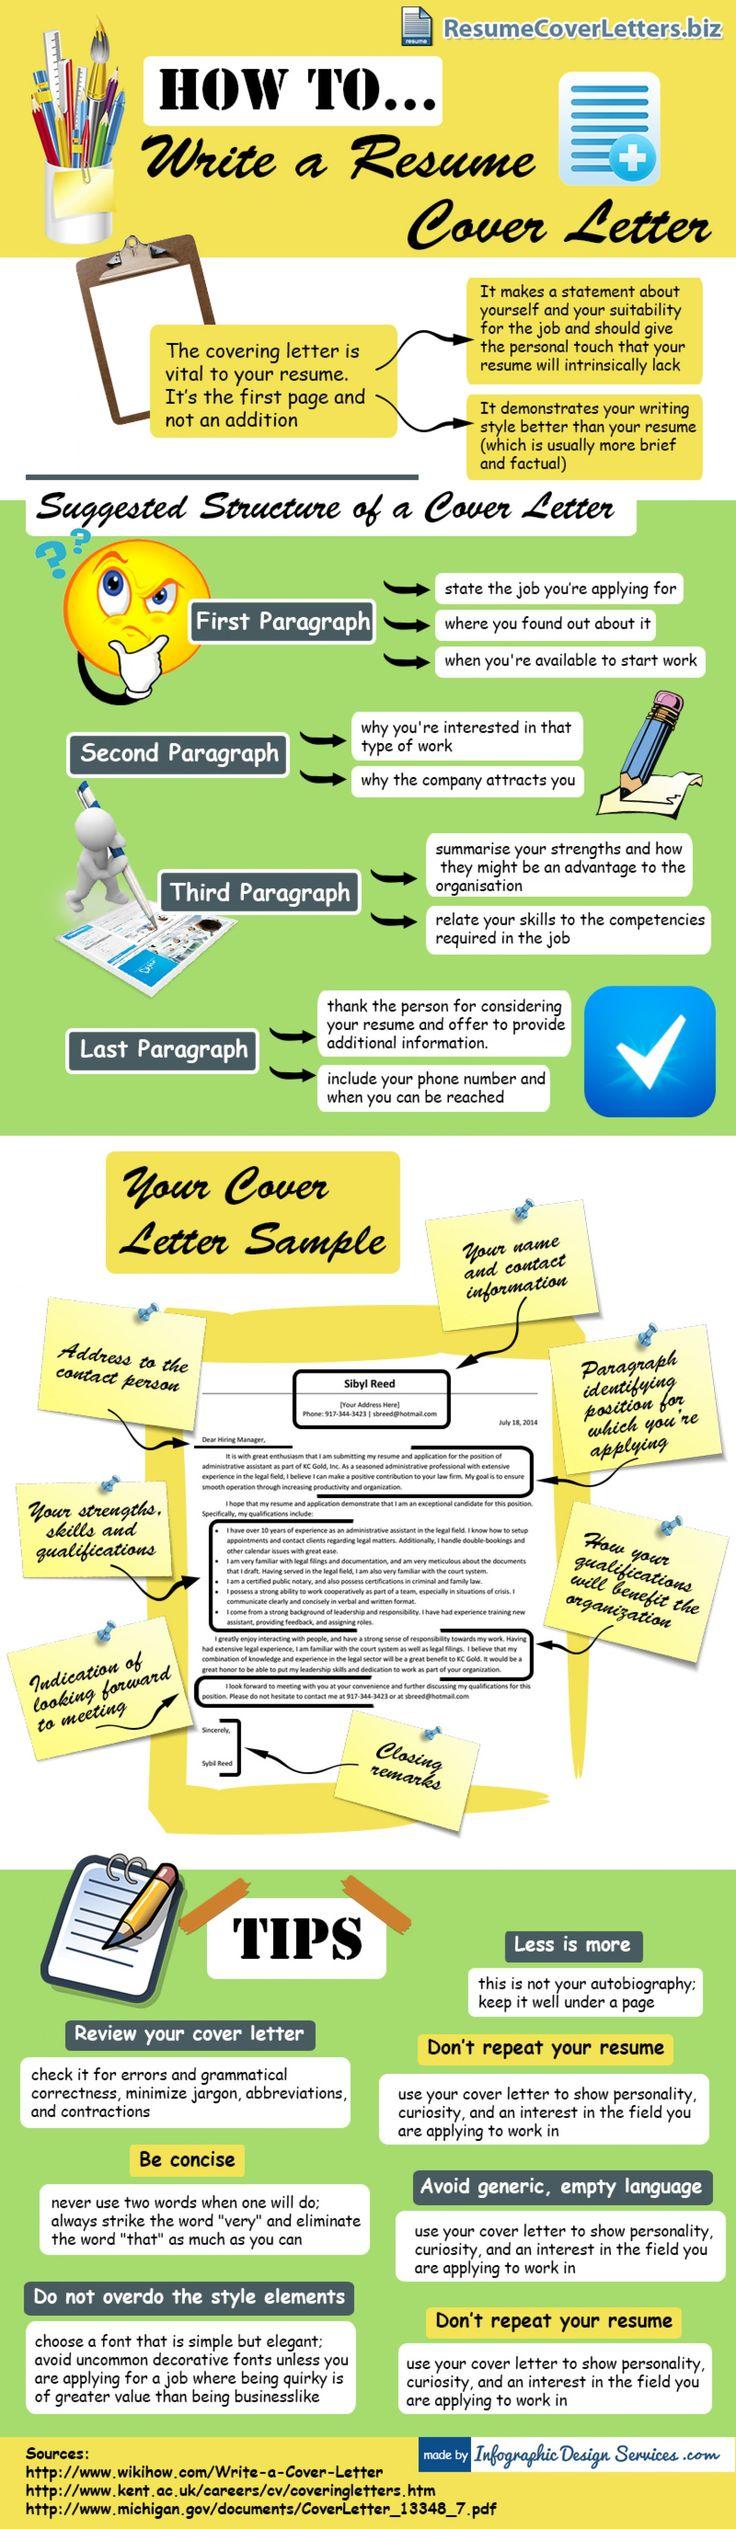 template resume cover letter images letter samples format